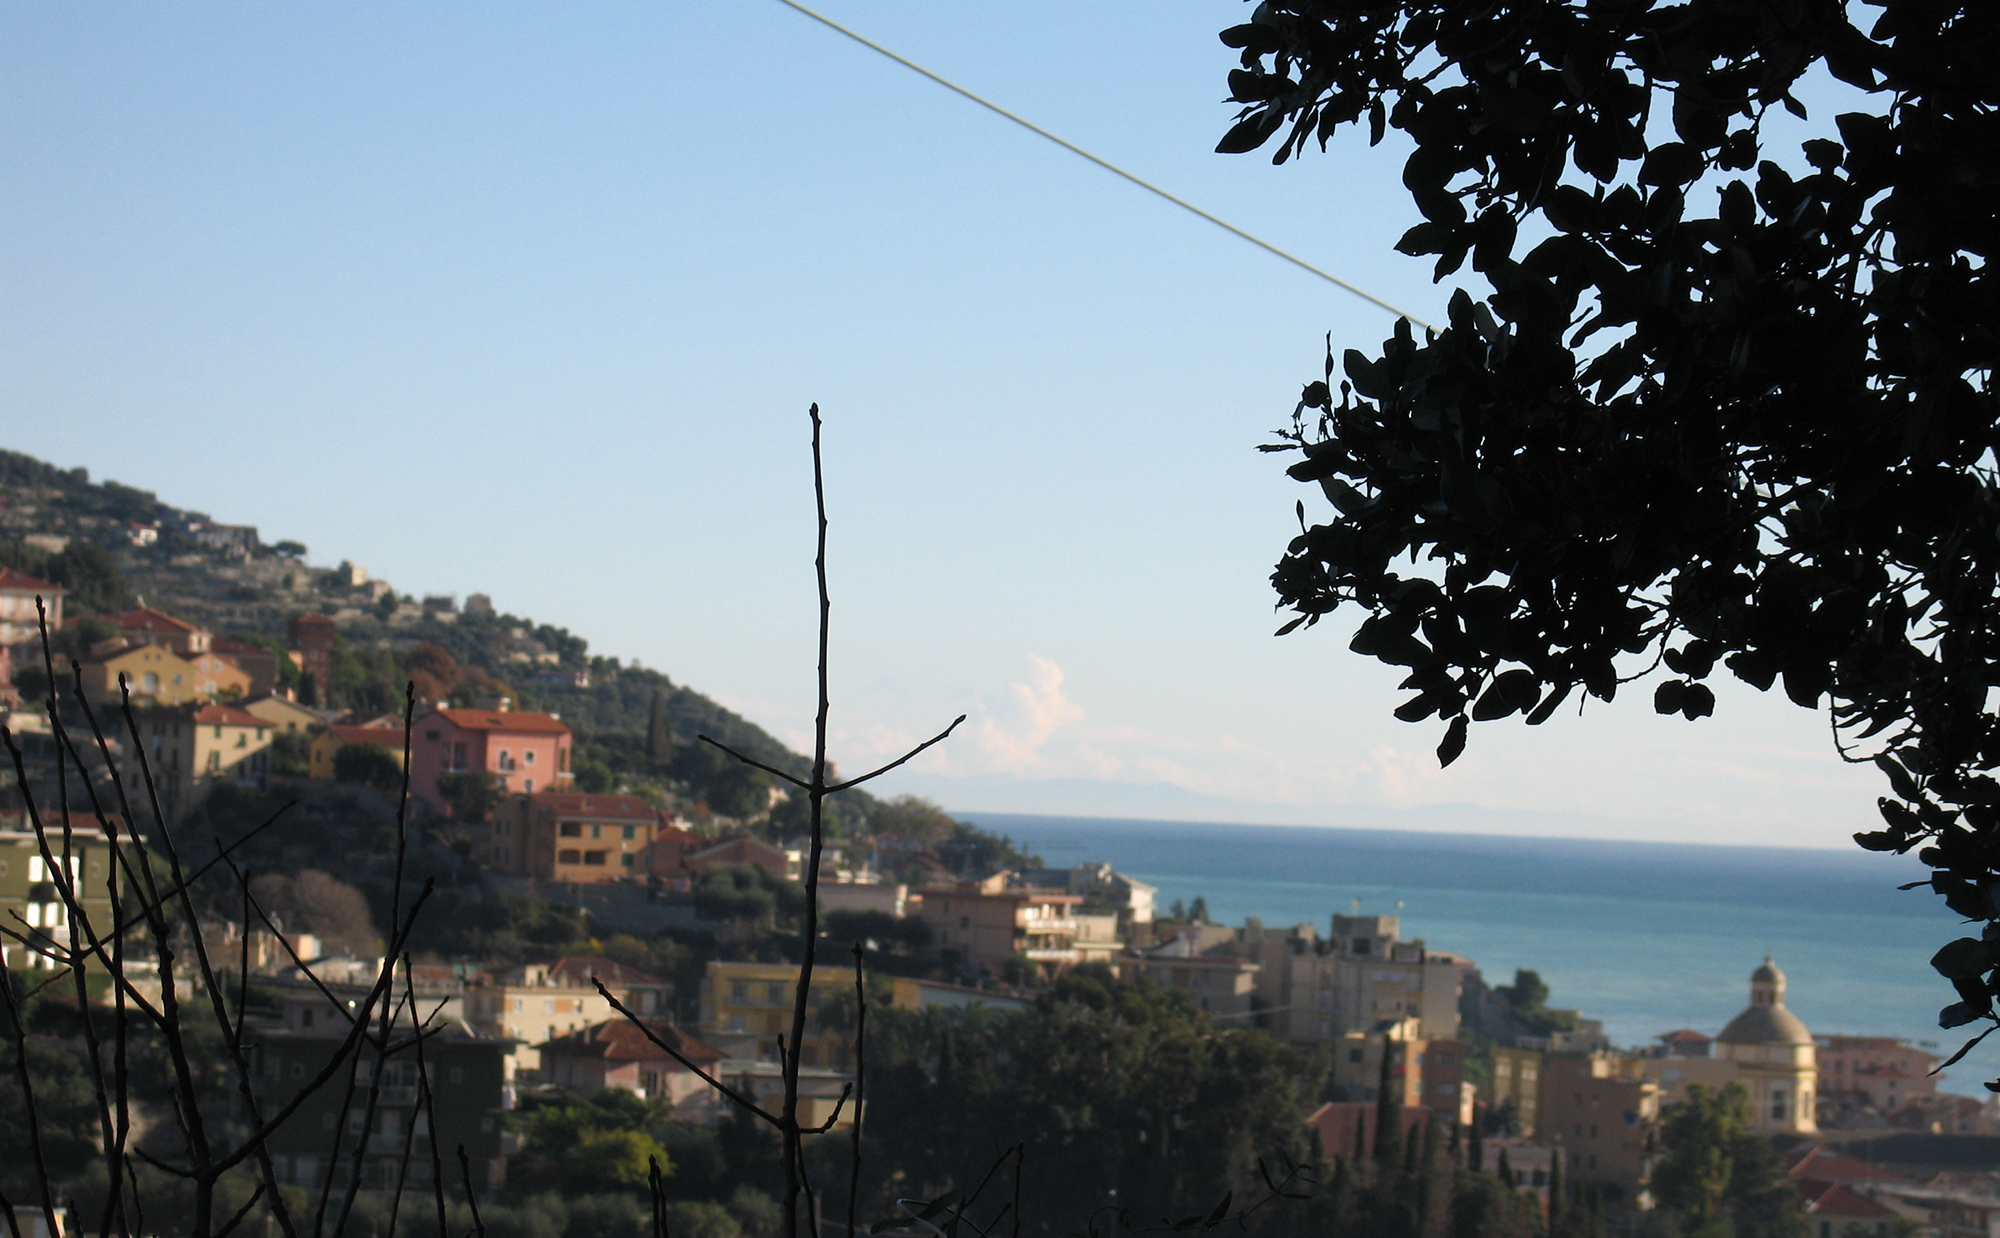 Casa Barbara taken from Caprazzoppa Hill